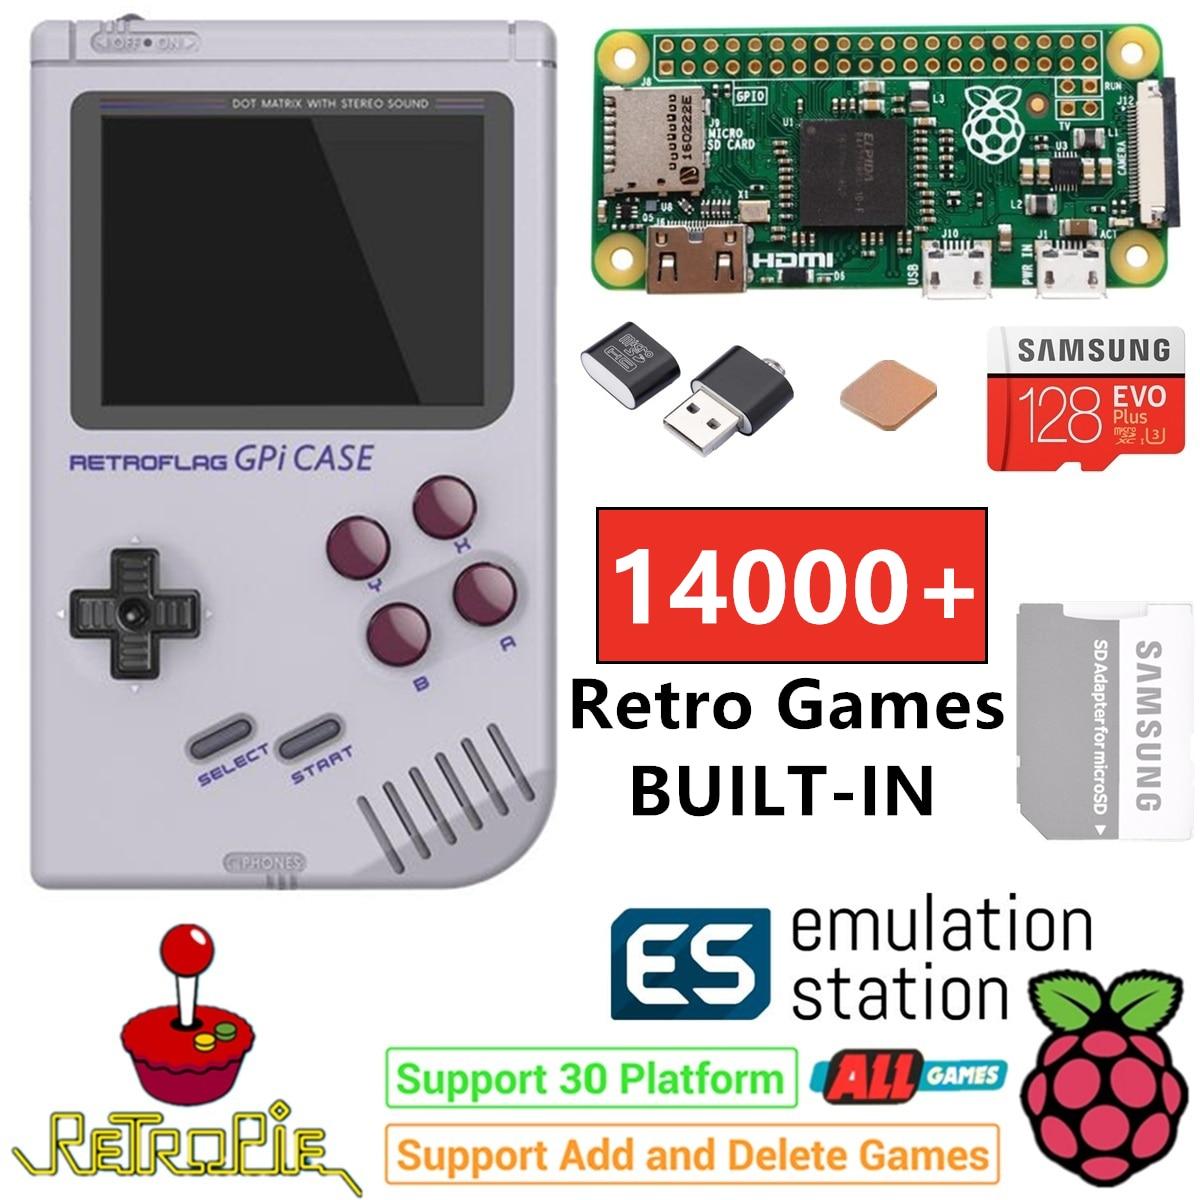 Raspberry Pi Zero Handheld Game Console GPi Case Safe Shutdown 128GB 14000  Games Customized ES Retropie Emulation Game Station